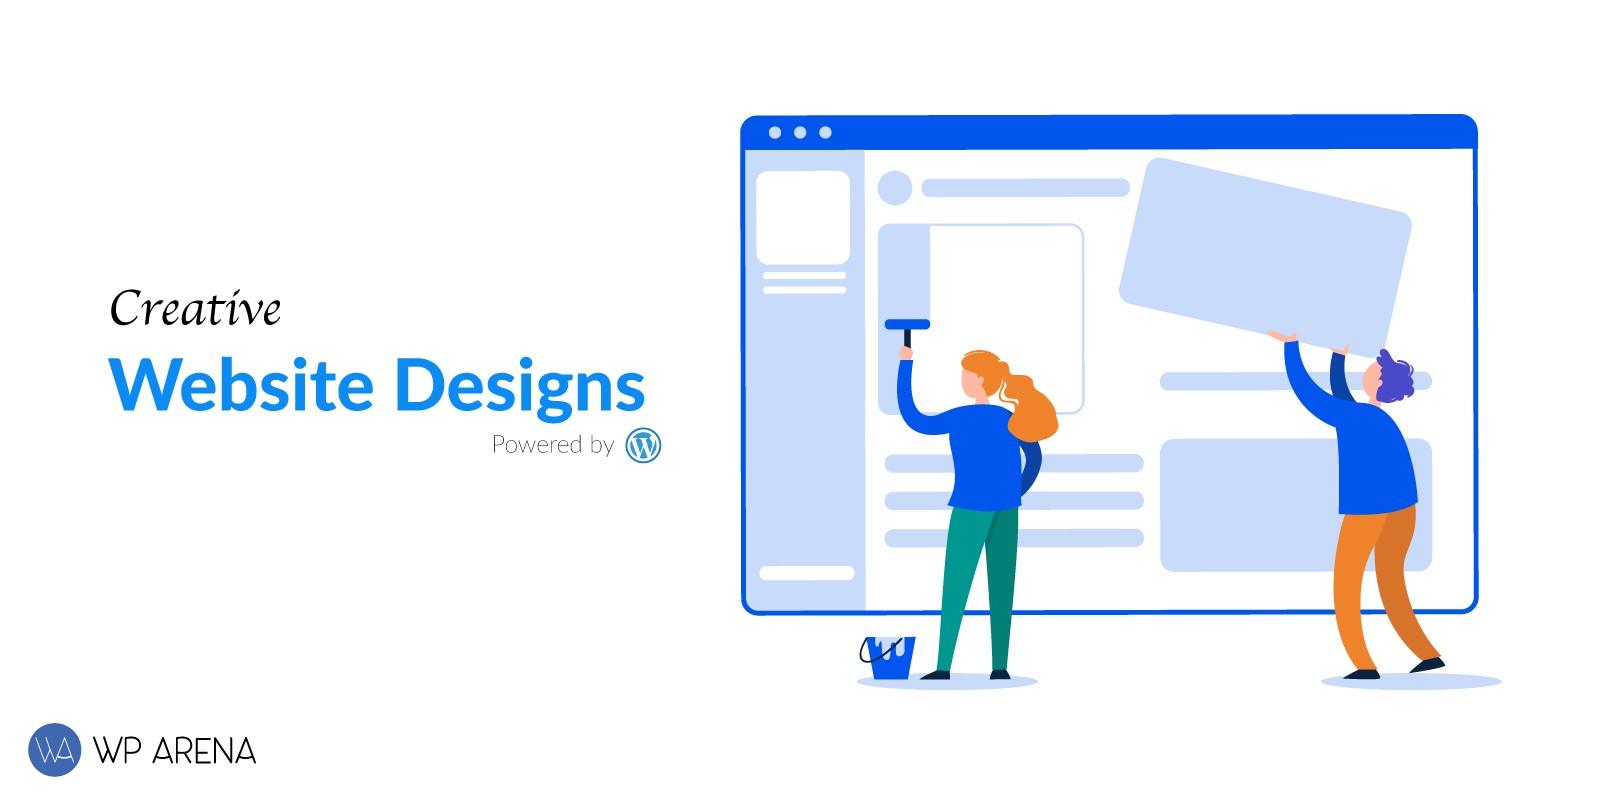 Creative website designs powered by WordPress